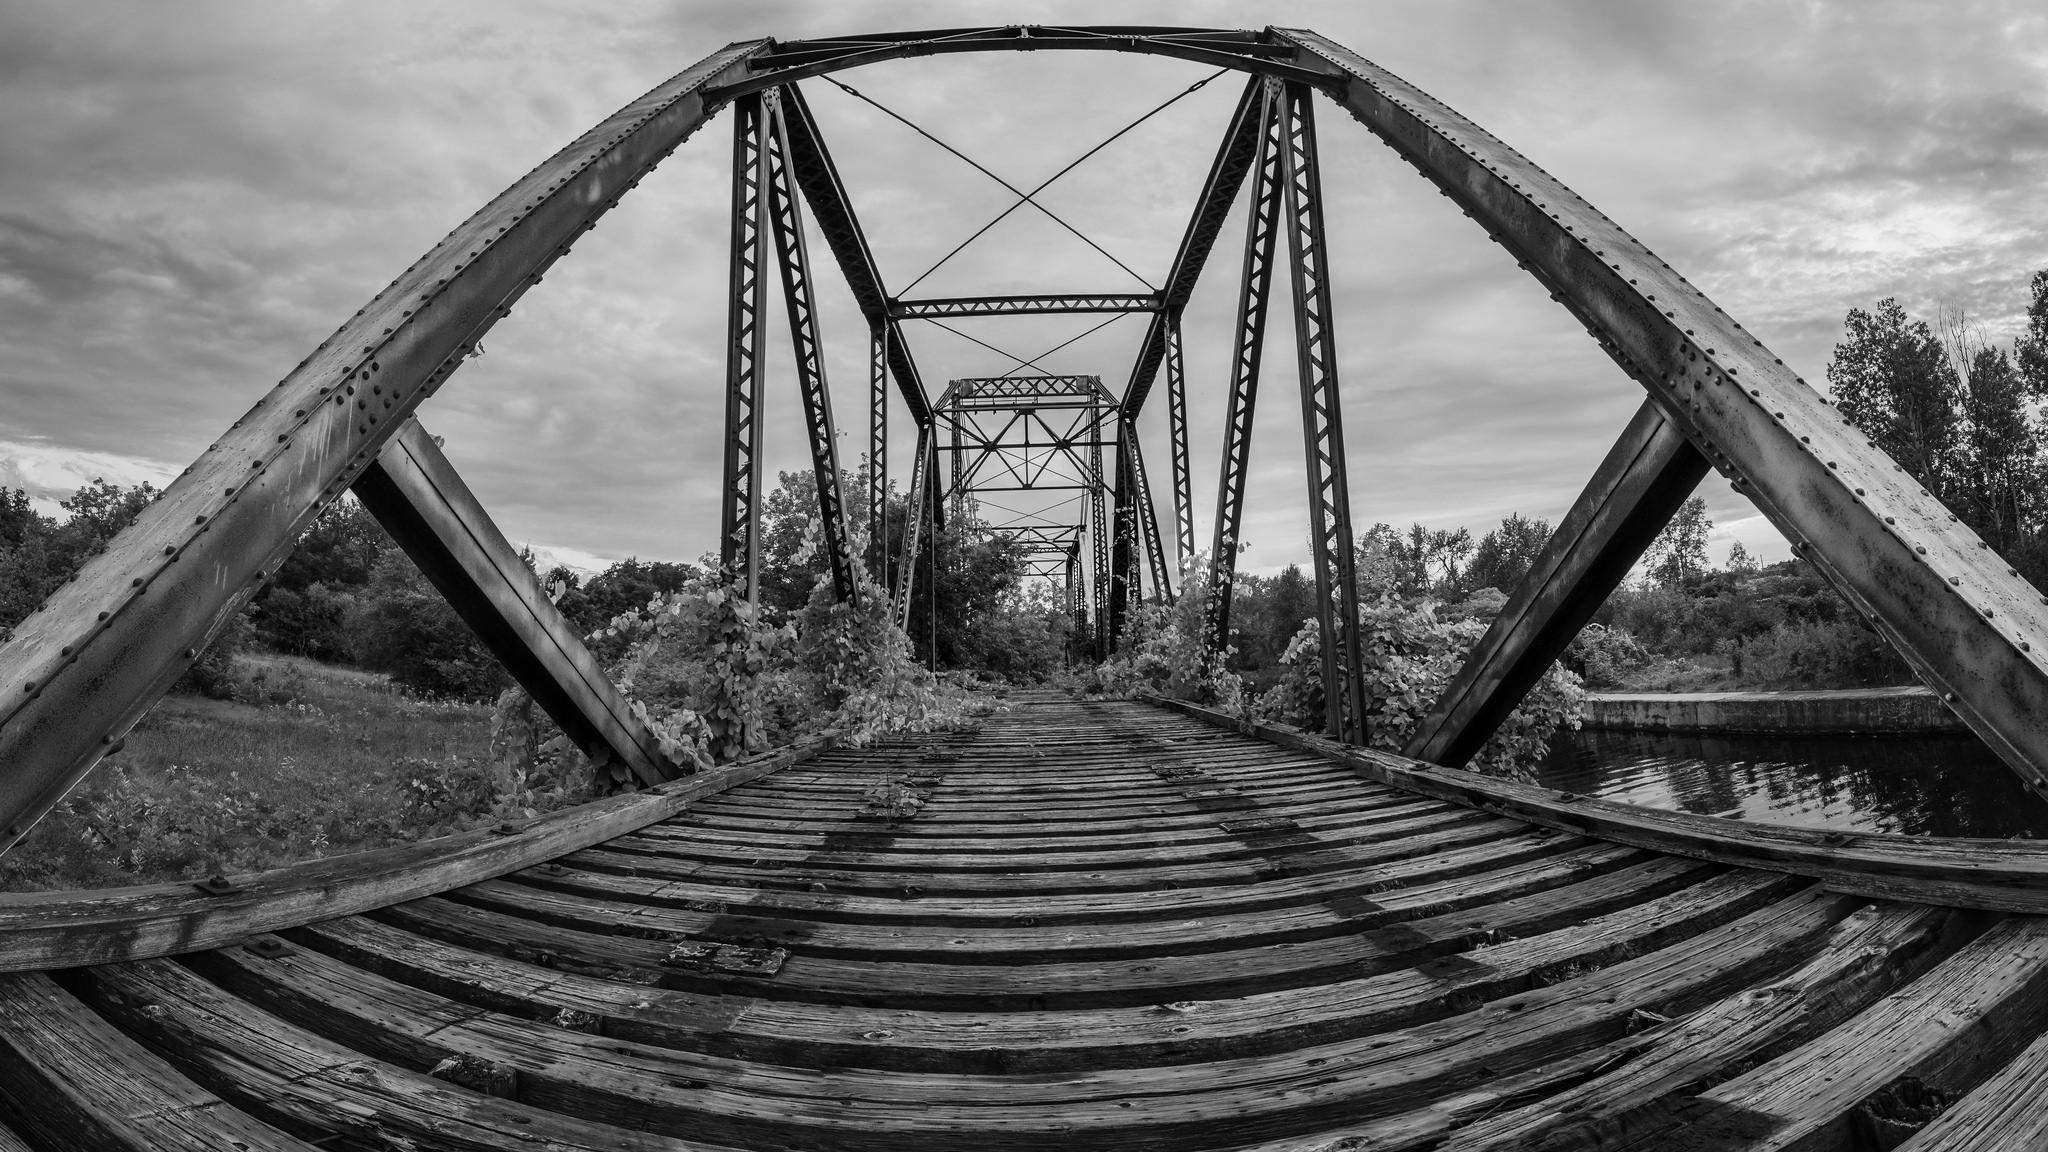 Old Swinging Rail Bridge (1/125s, f/8, ISO800)